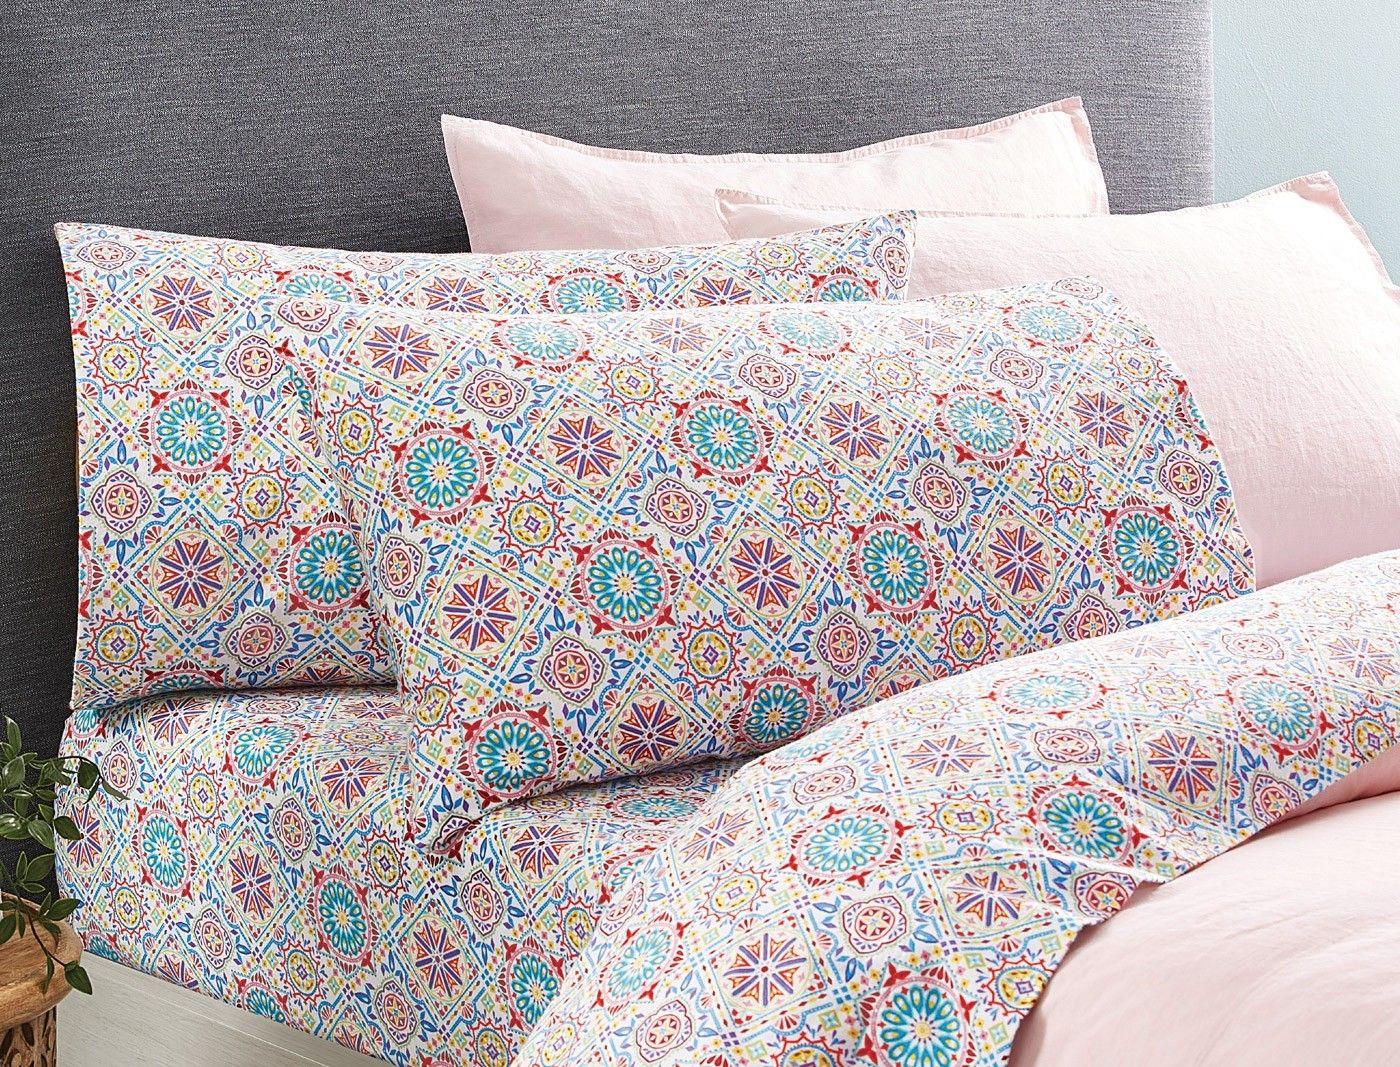 Mosaic Flannelette Sheet Set Bed Bath N' Table